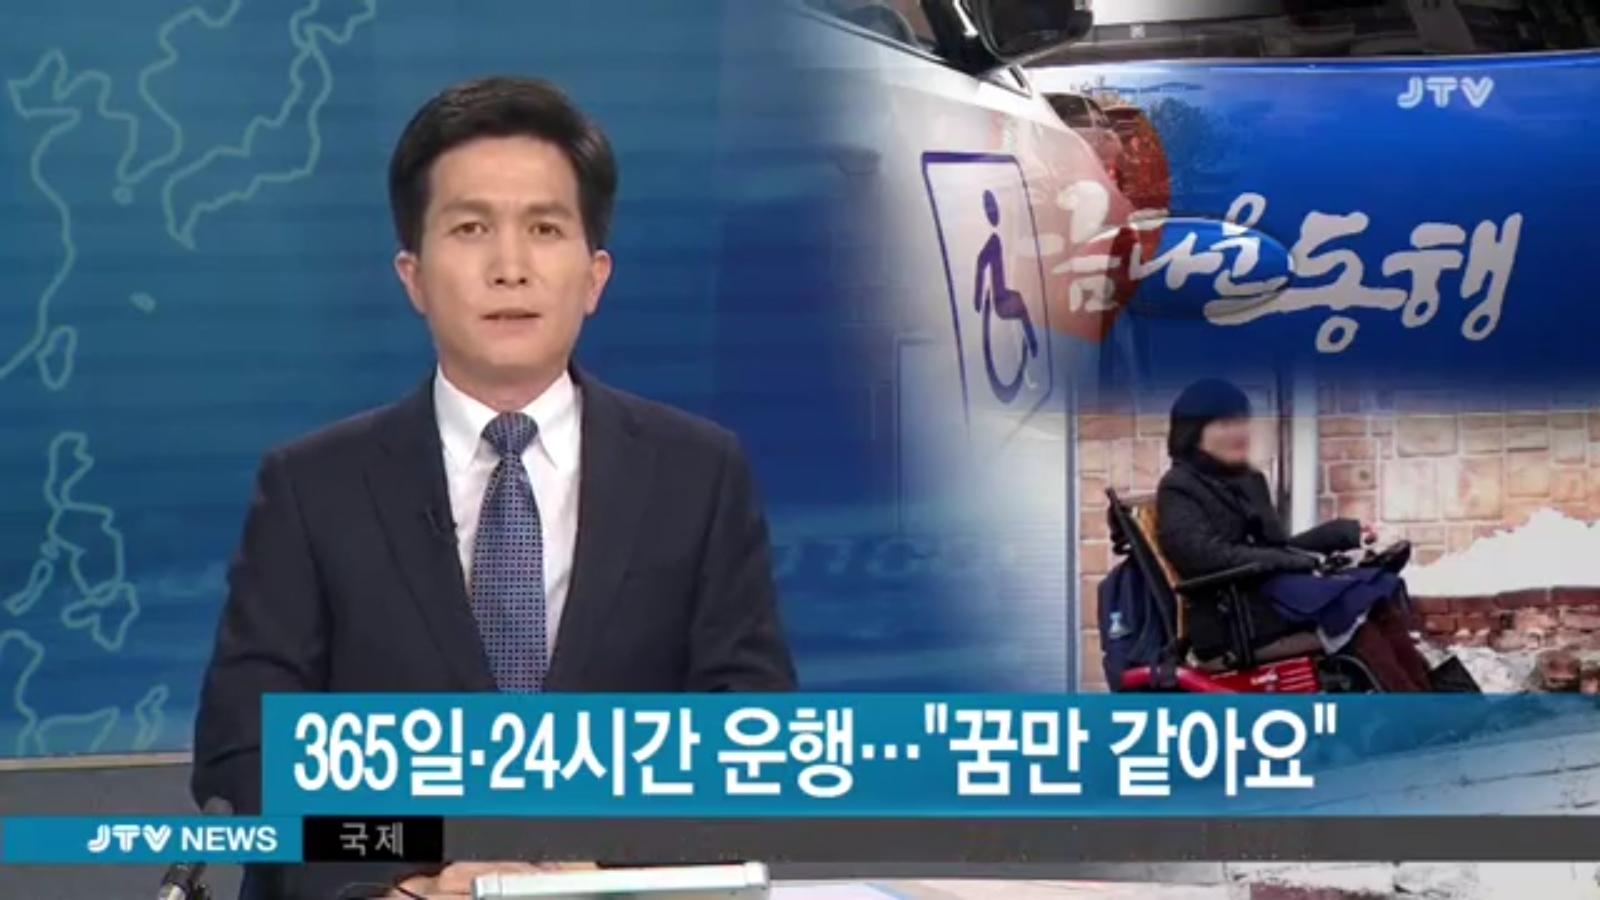 [18.1.25 JTV] 전북도, 356일 24시간 장애인콜택시 운영키로1.jpg